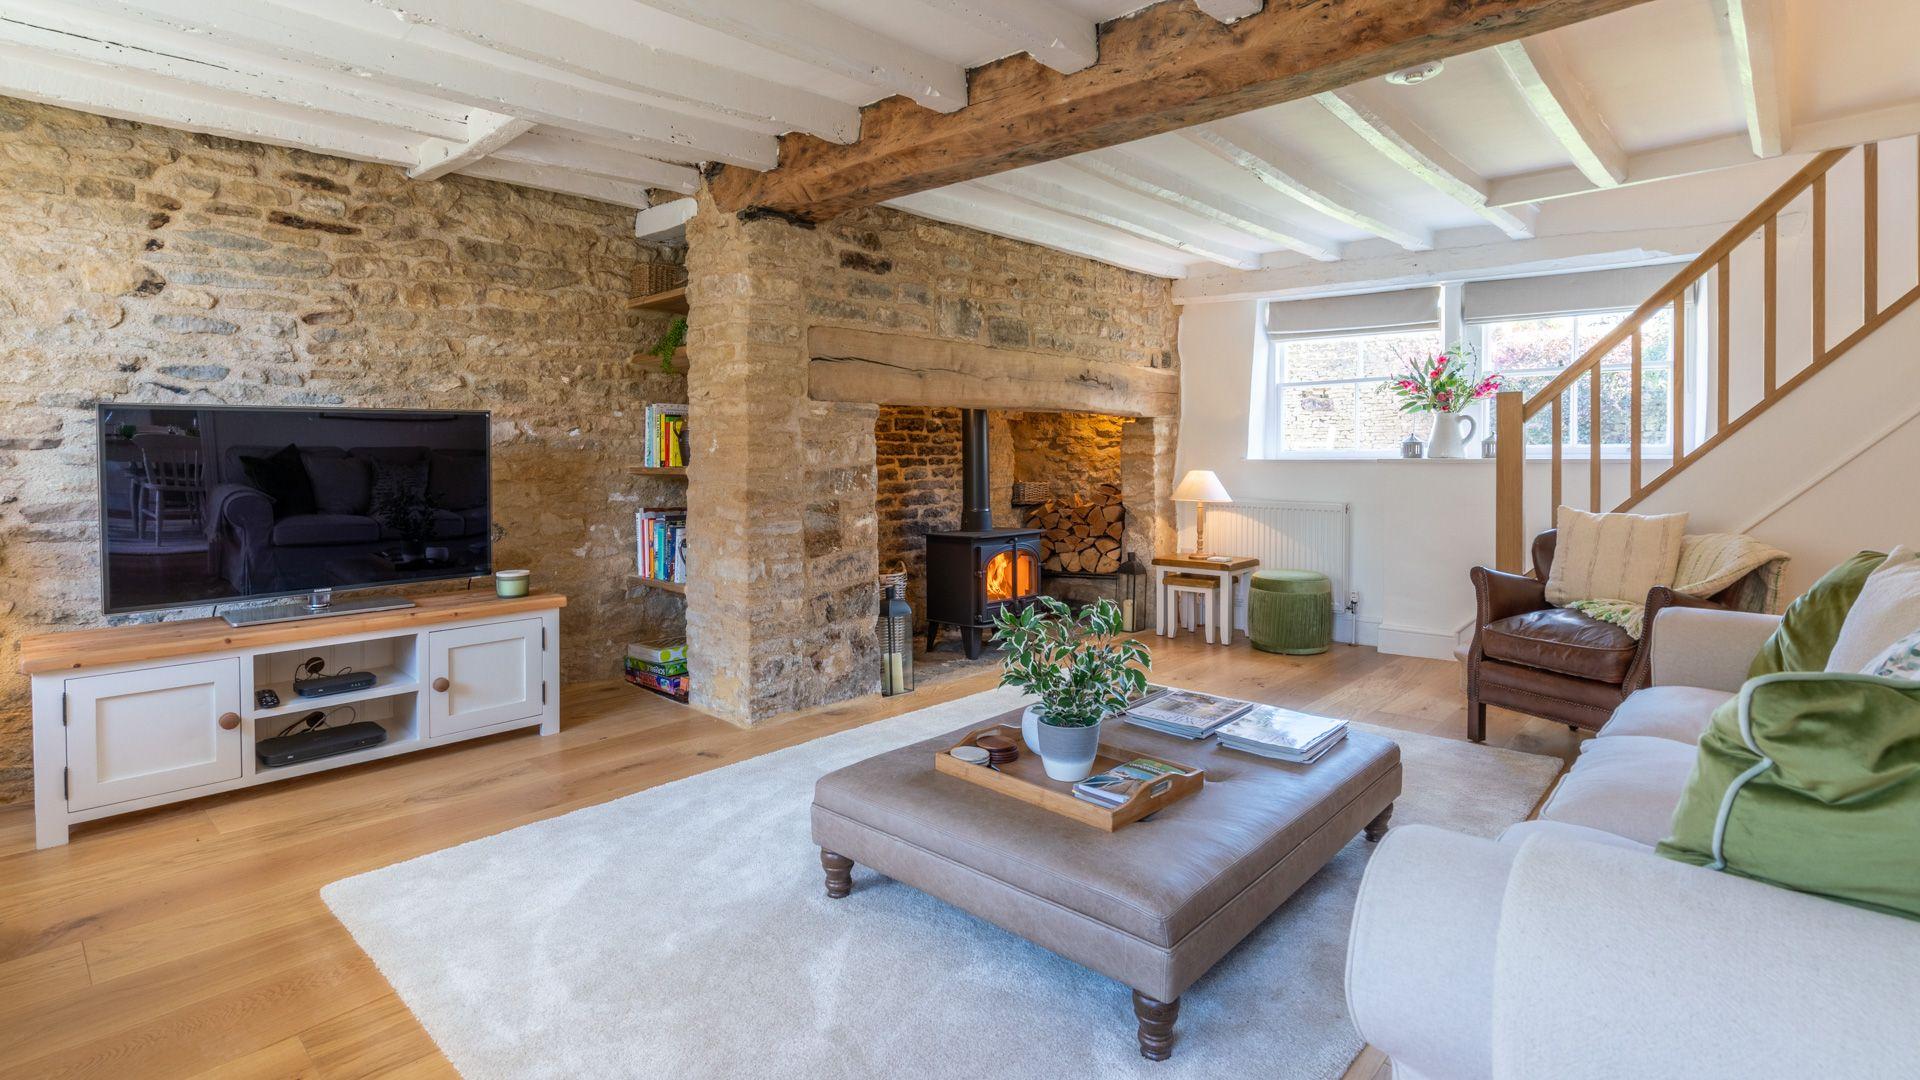 Living room with log burner, Tachbrook, Bolthole Retreats